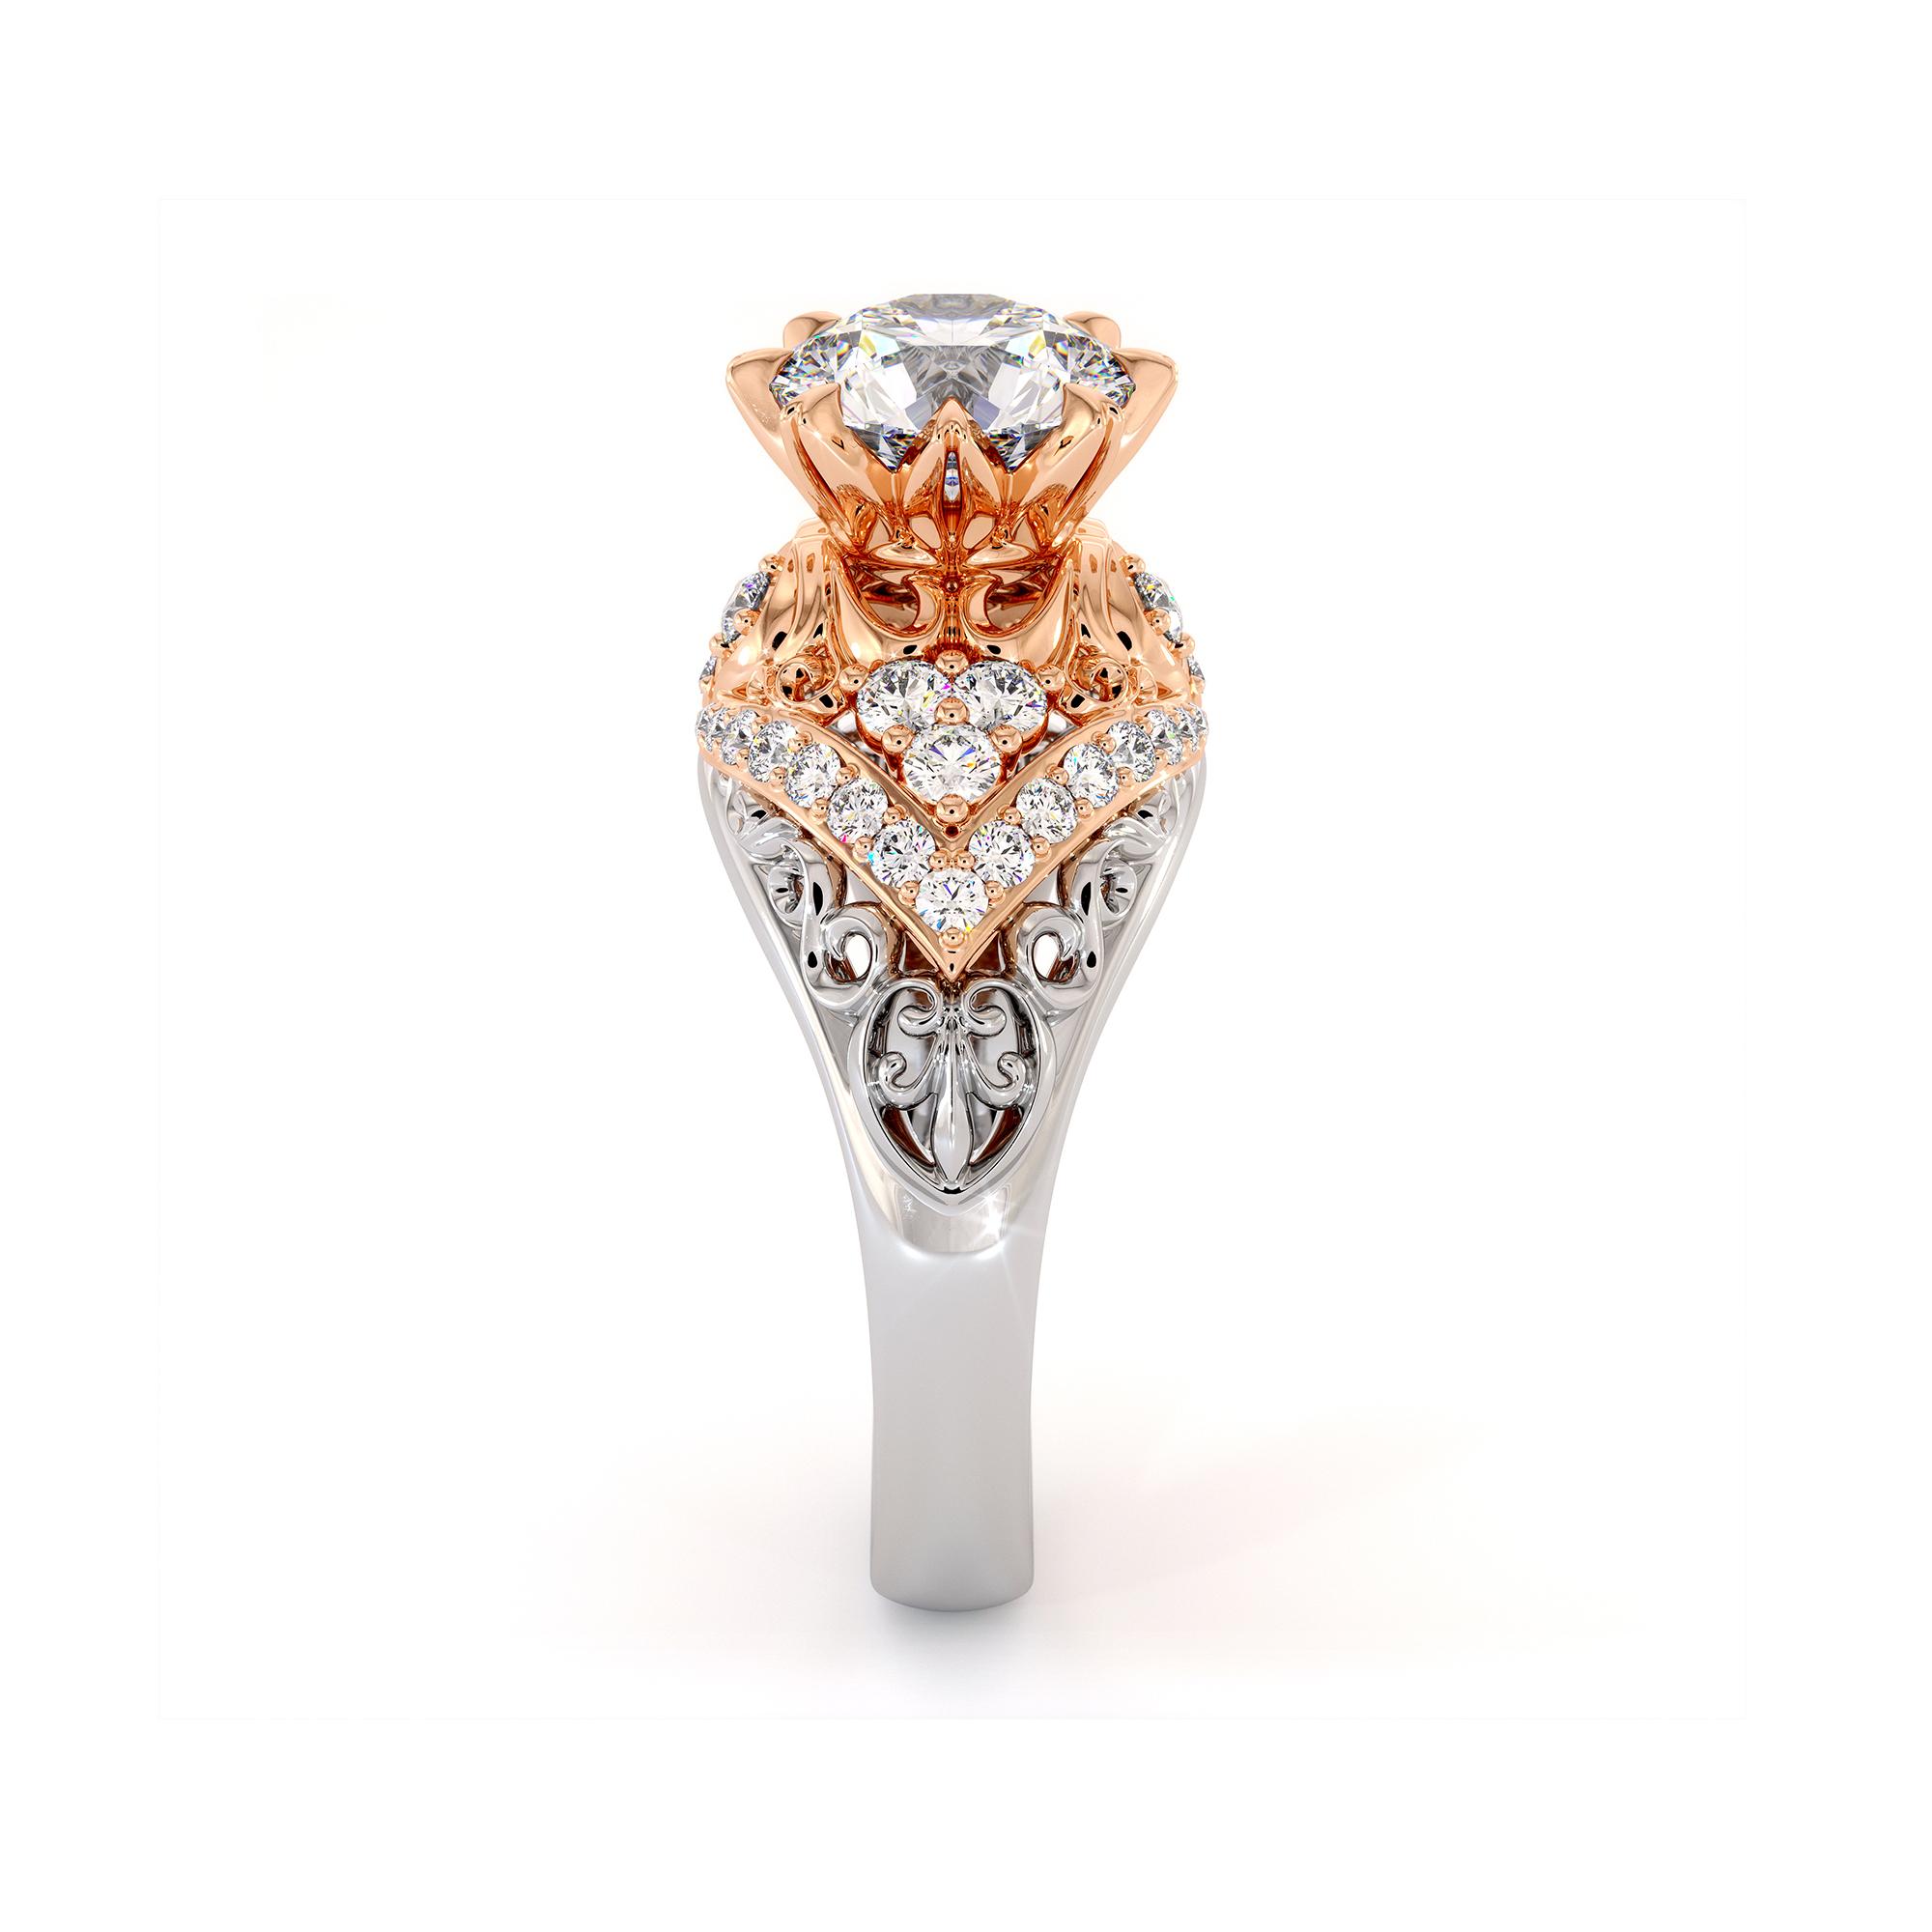 Exalted Diamonds Engagement Ring 1.55 Carat Round Moissanite Ring Two Tone Gold Engagement Ring Diamonds V Ring